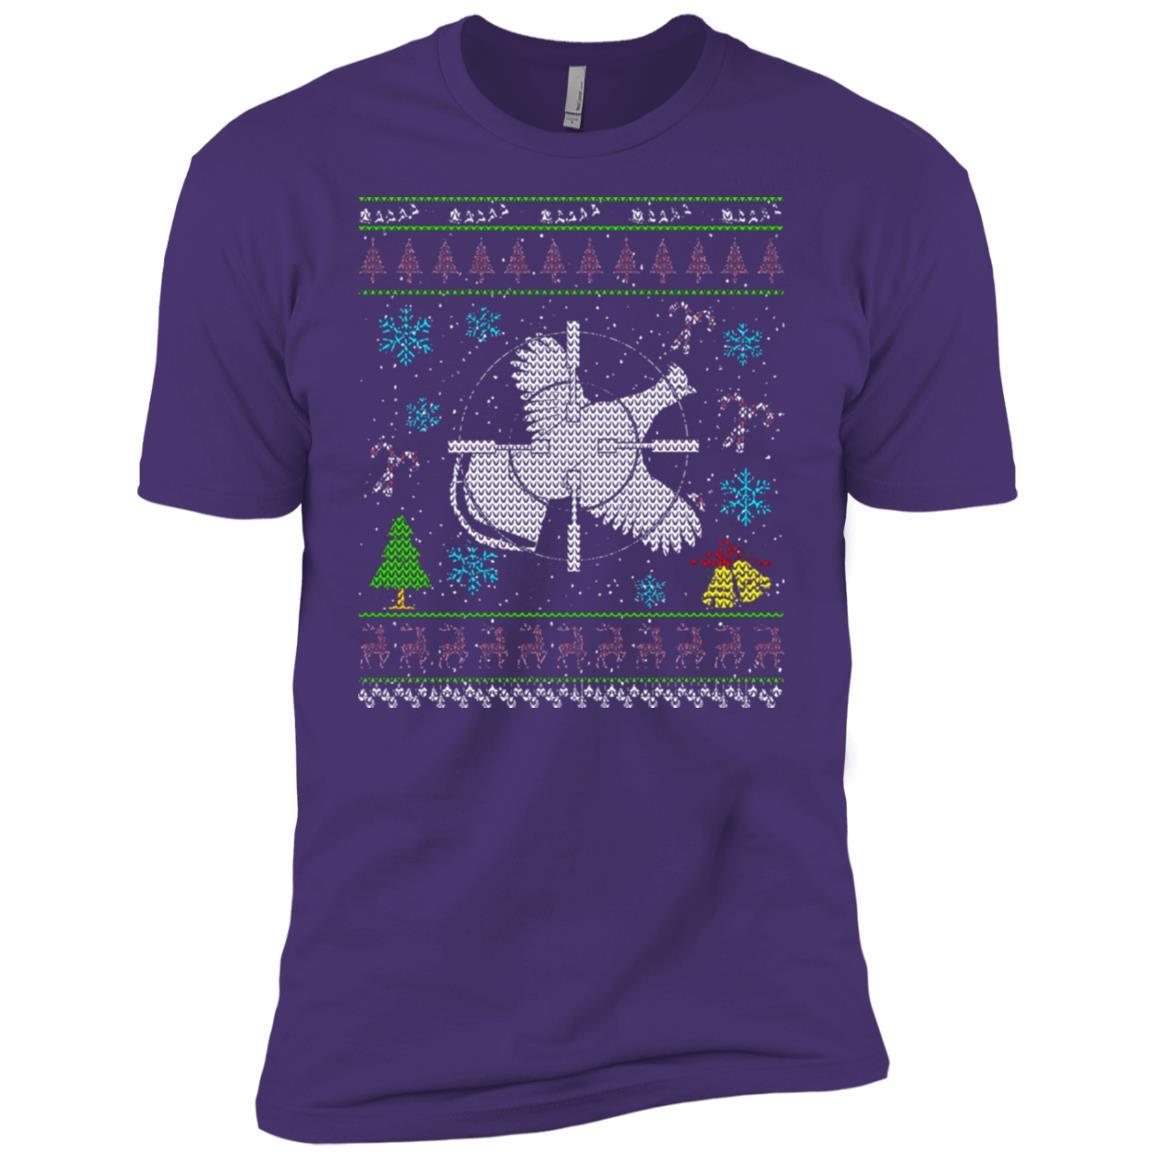 Grouse Hunting Chrismas Ugly Holiday Men Short Sleeve T-Shirt